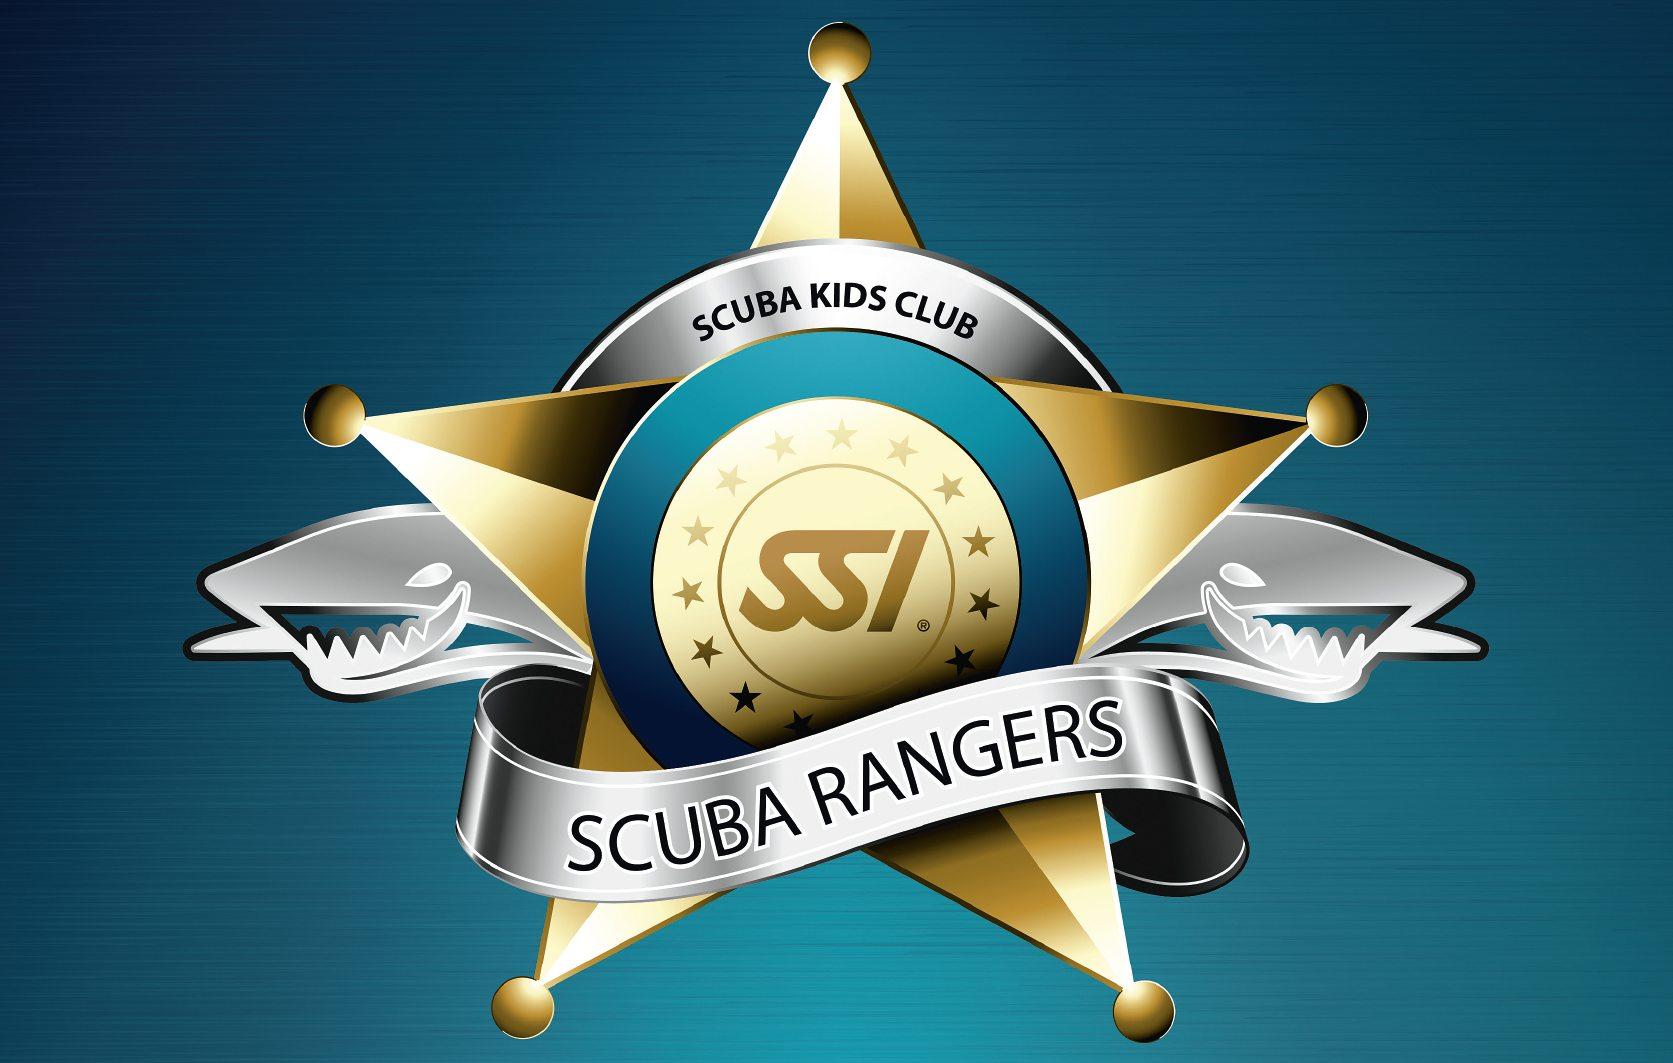 Deep Blue Scuba SSI Scuba Ranger